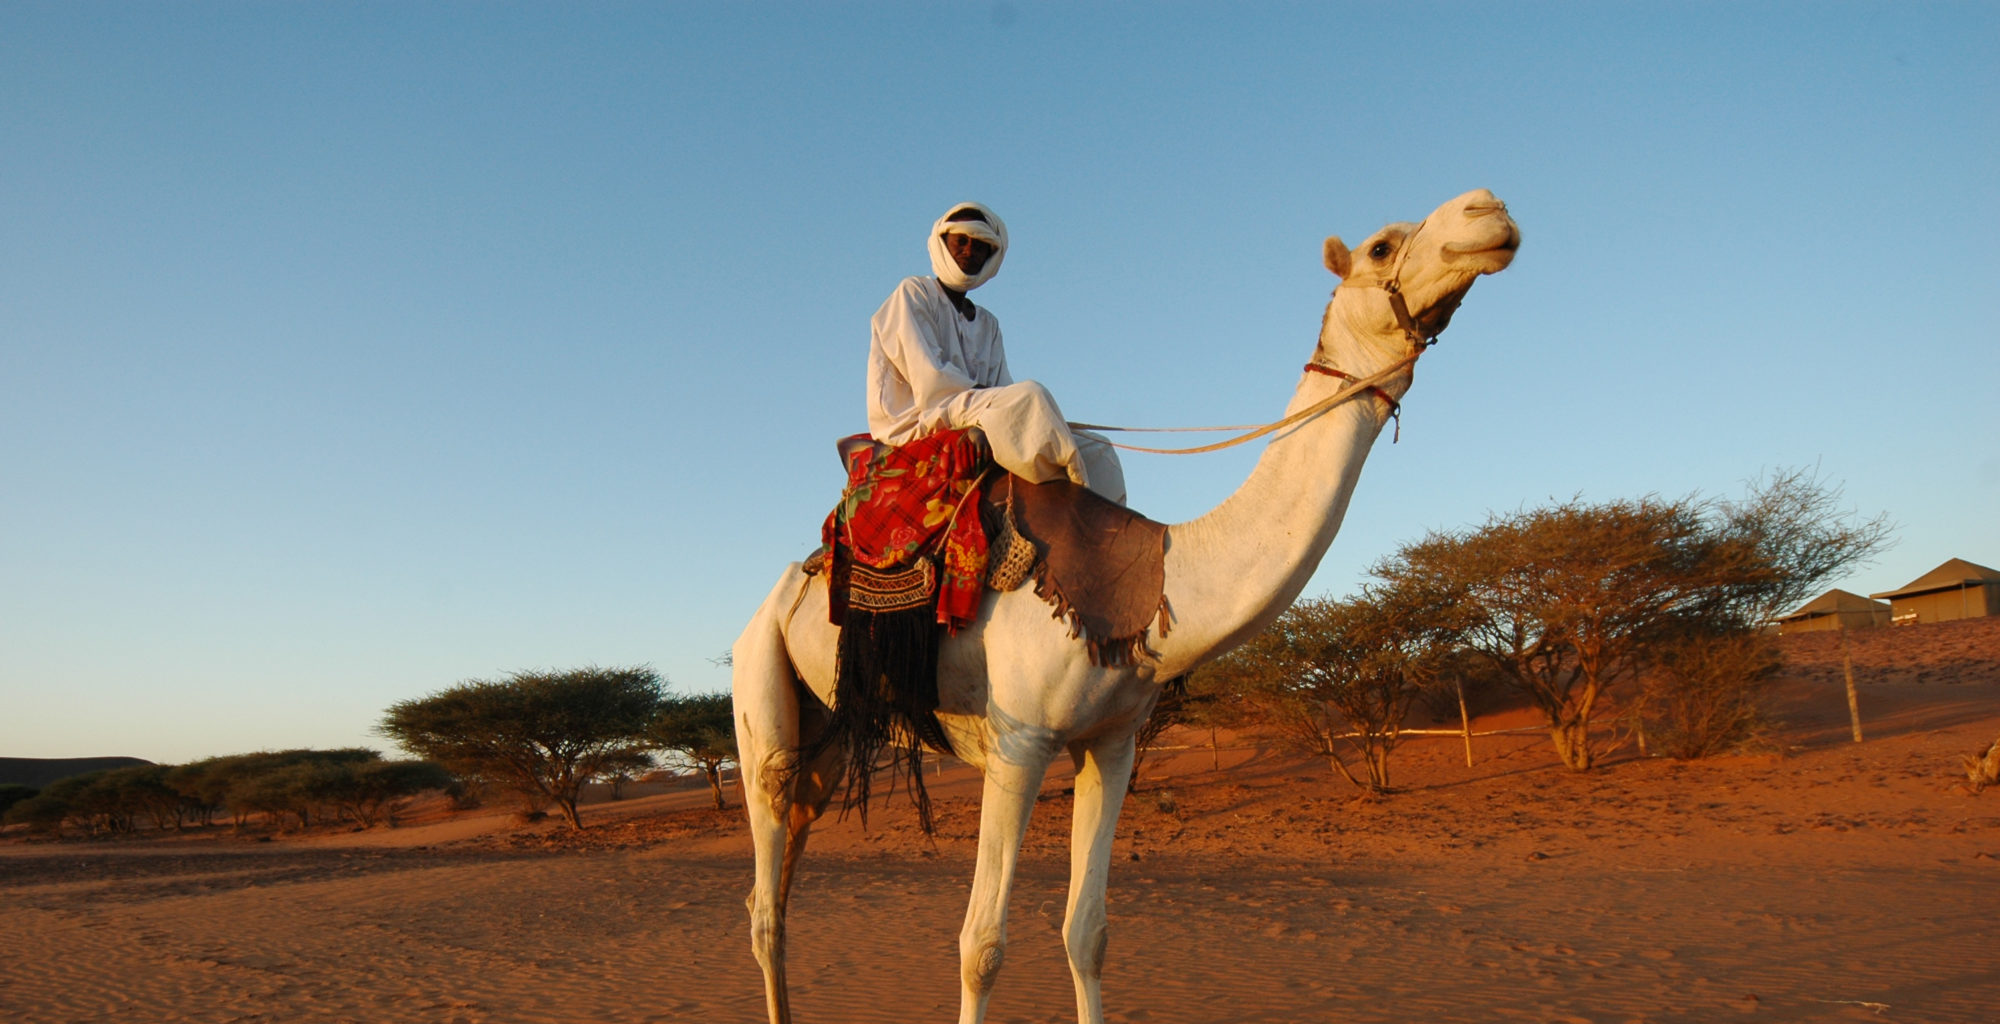 Meroe-Tented-Camp-Sudan-Camel